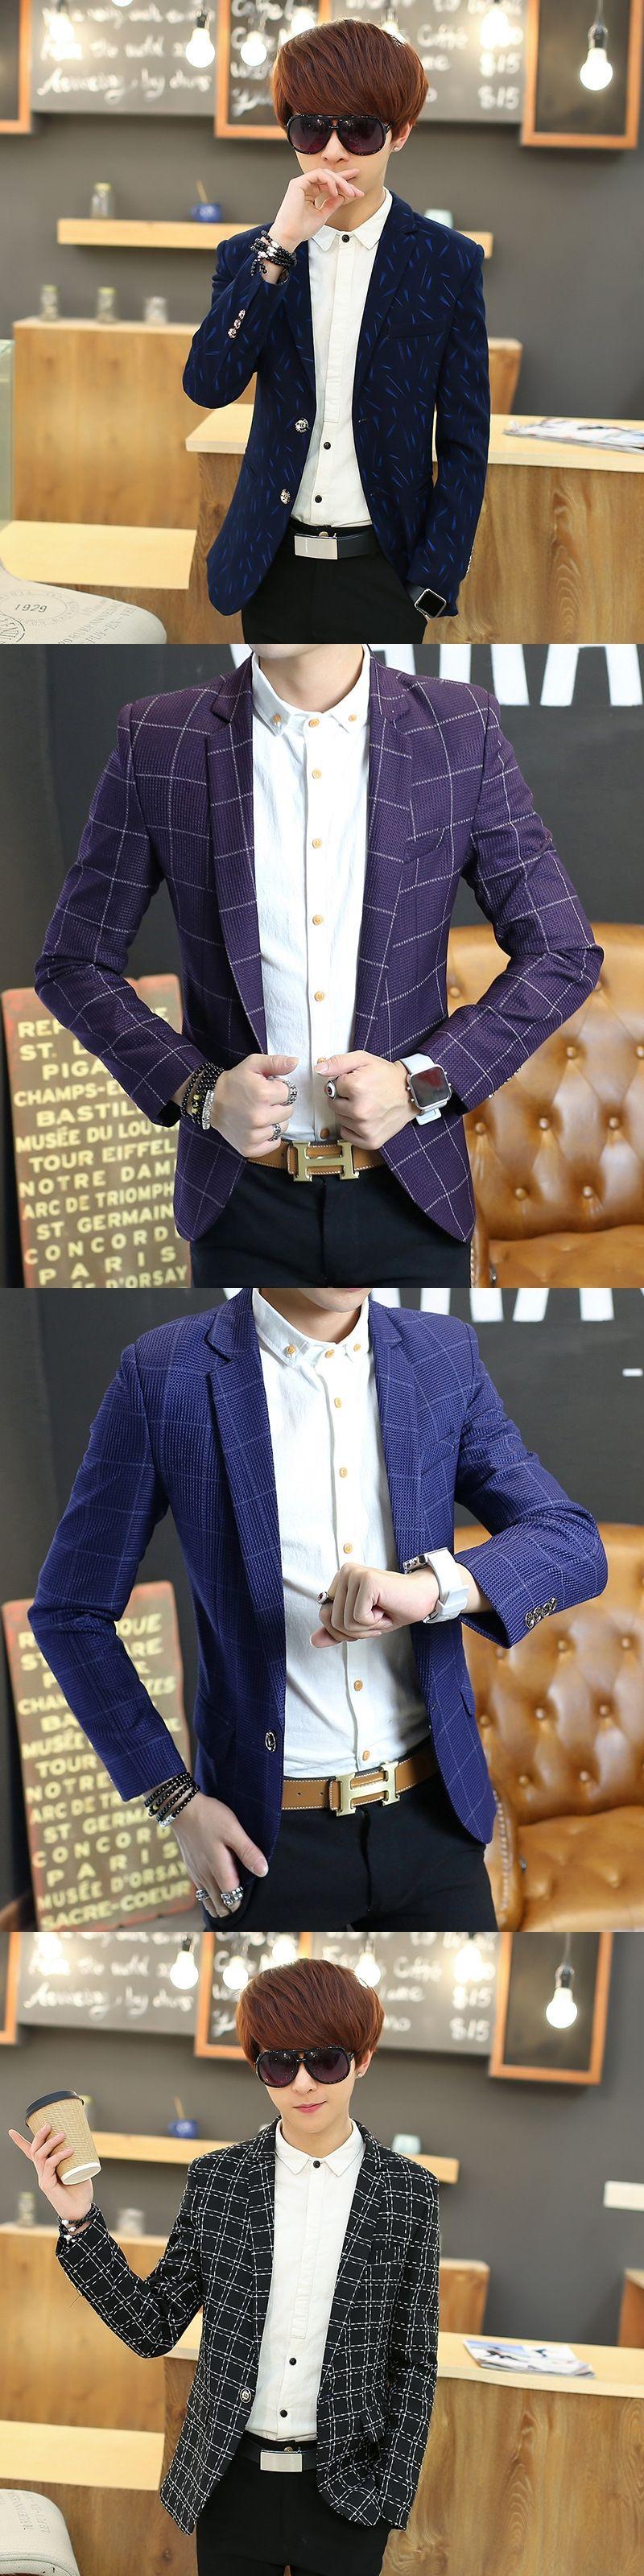 New autumn coat style luxury business casual suit men blazers set